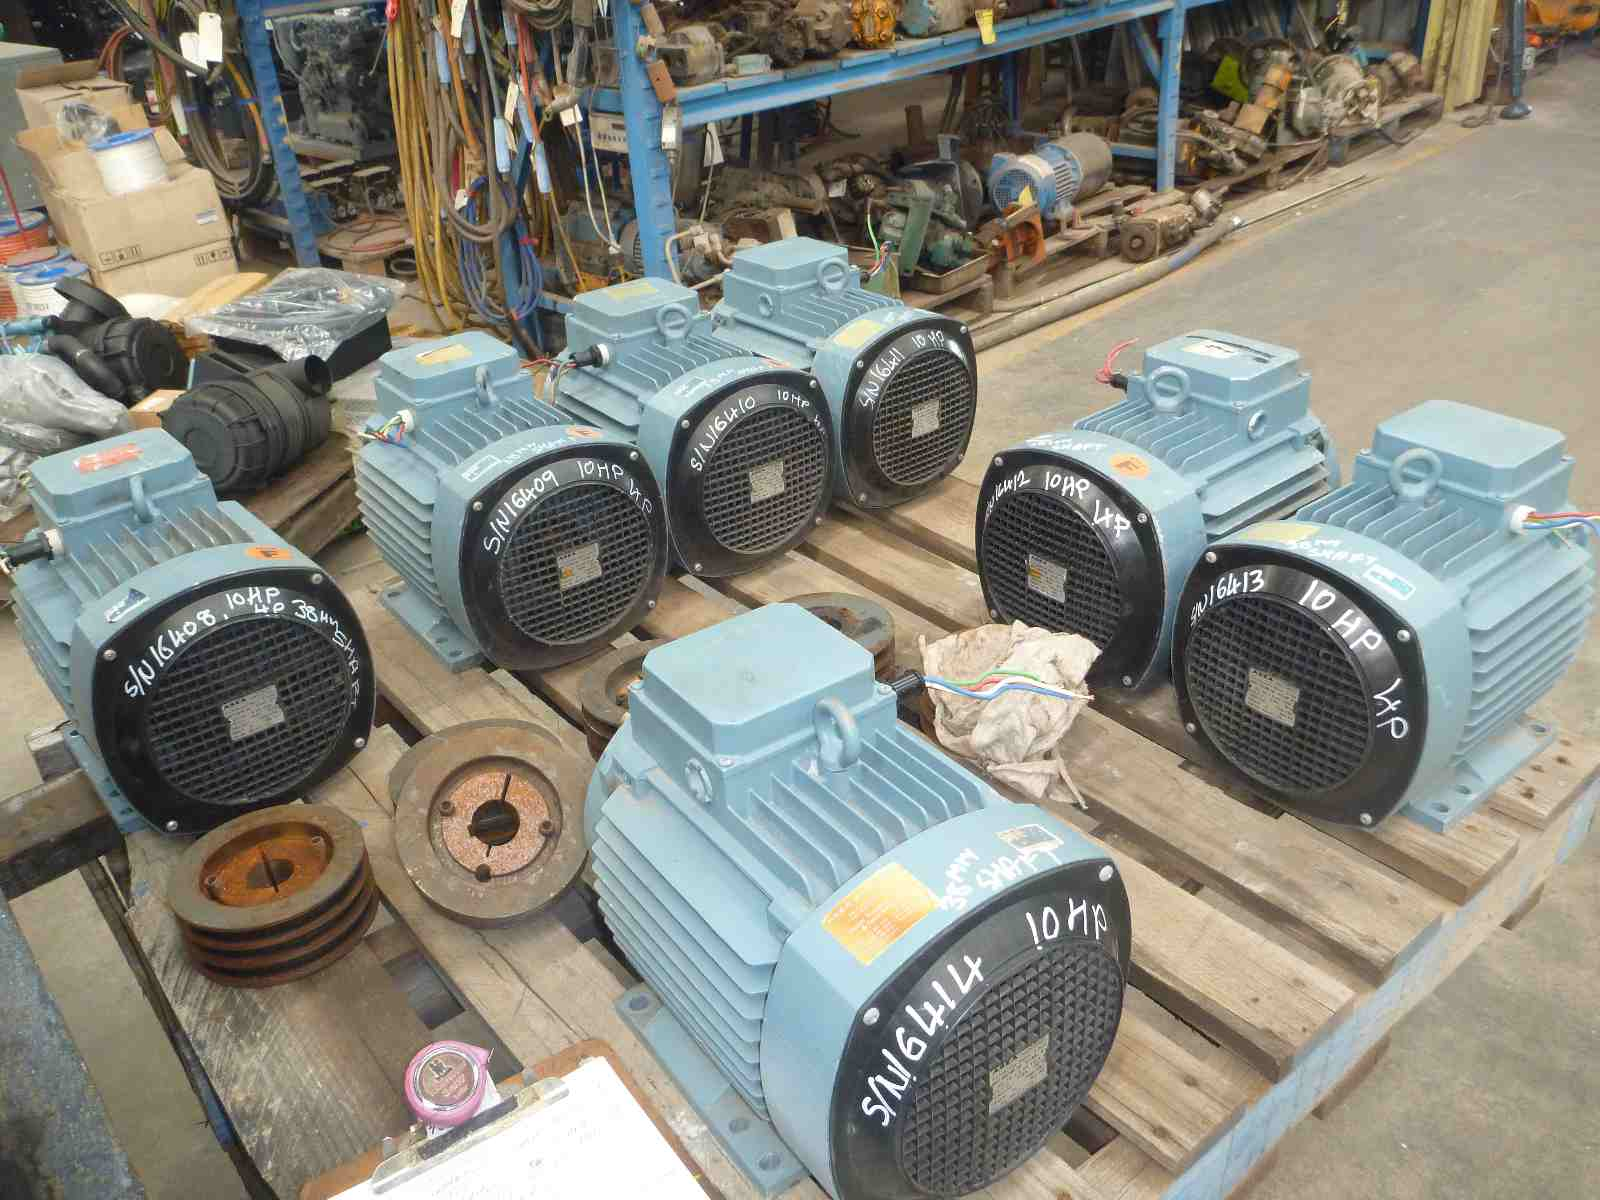 ASEA 10HP 3 PHASE ELECTRIC MOTOR | Bills Machinery.